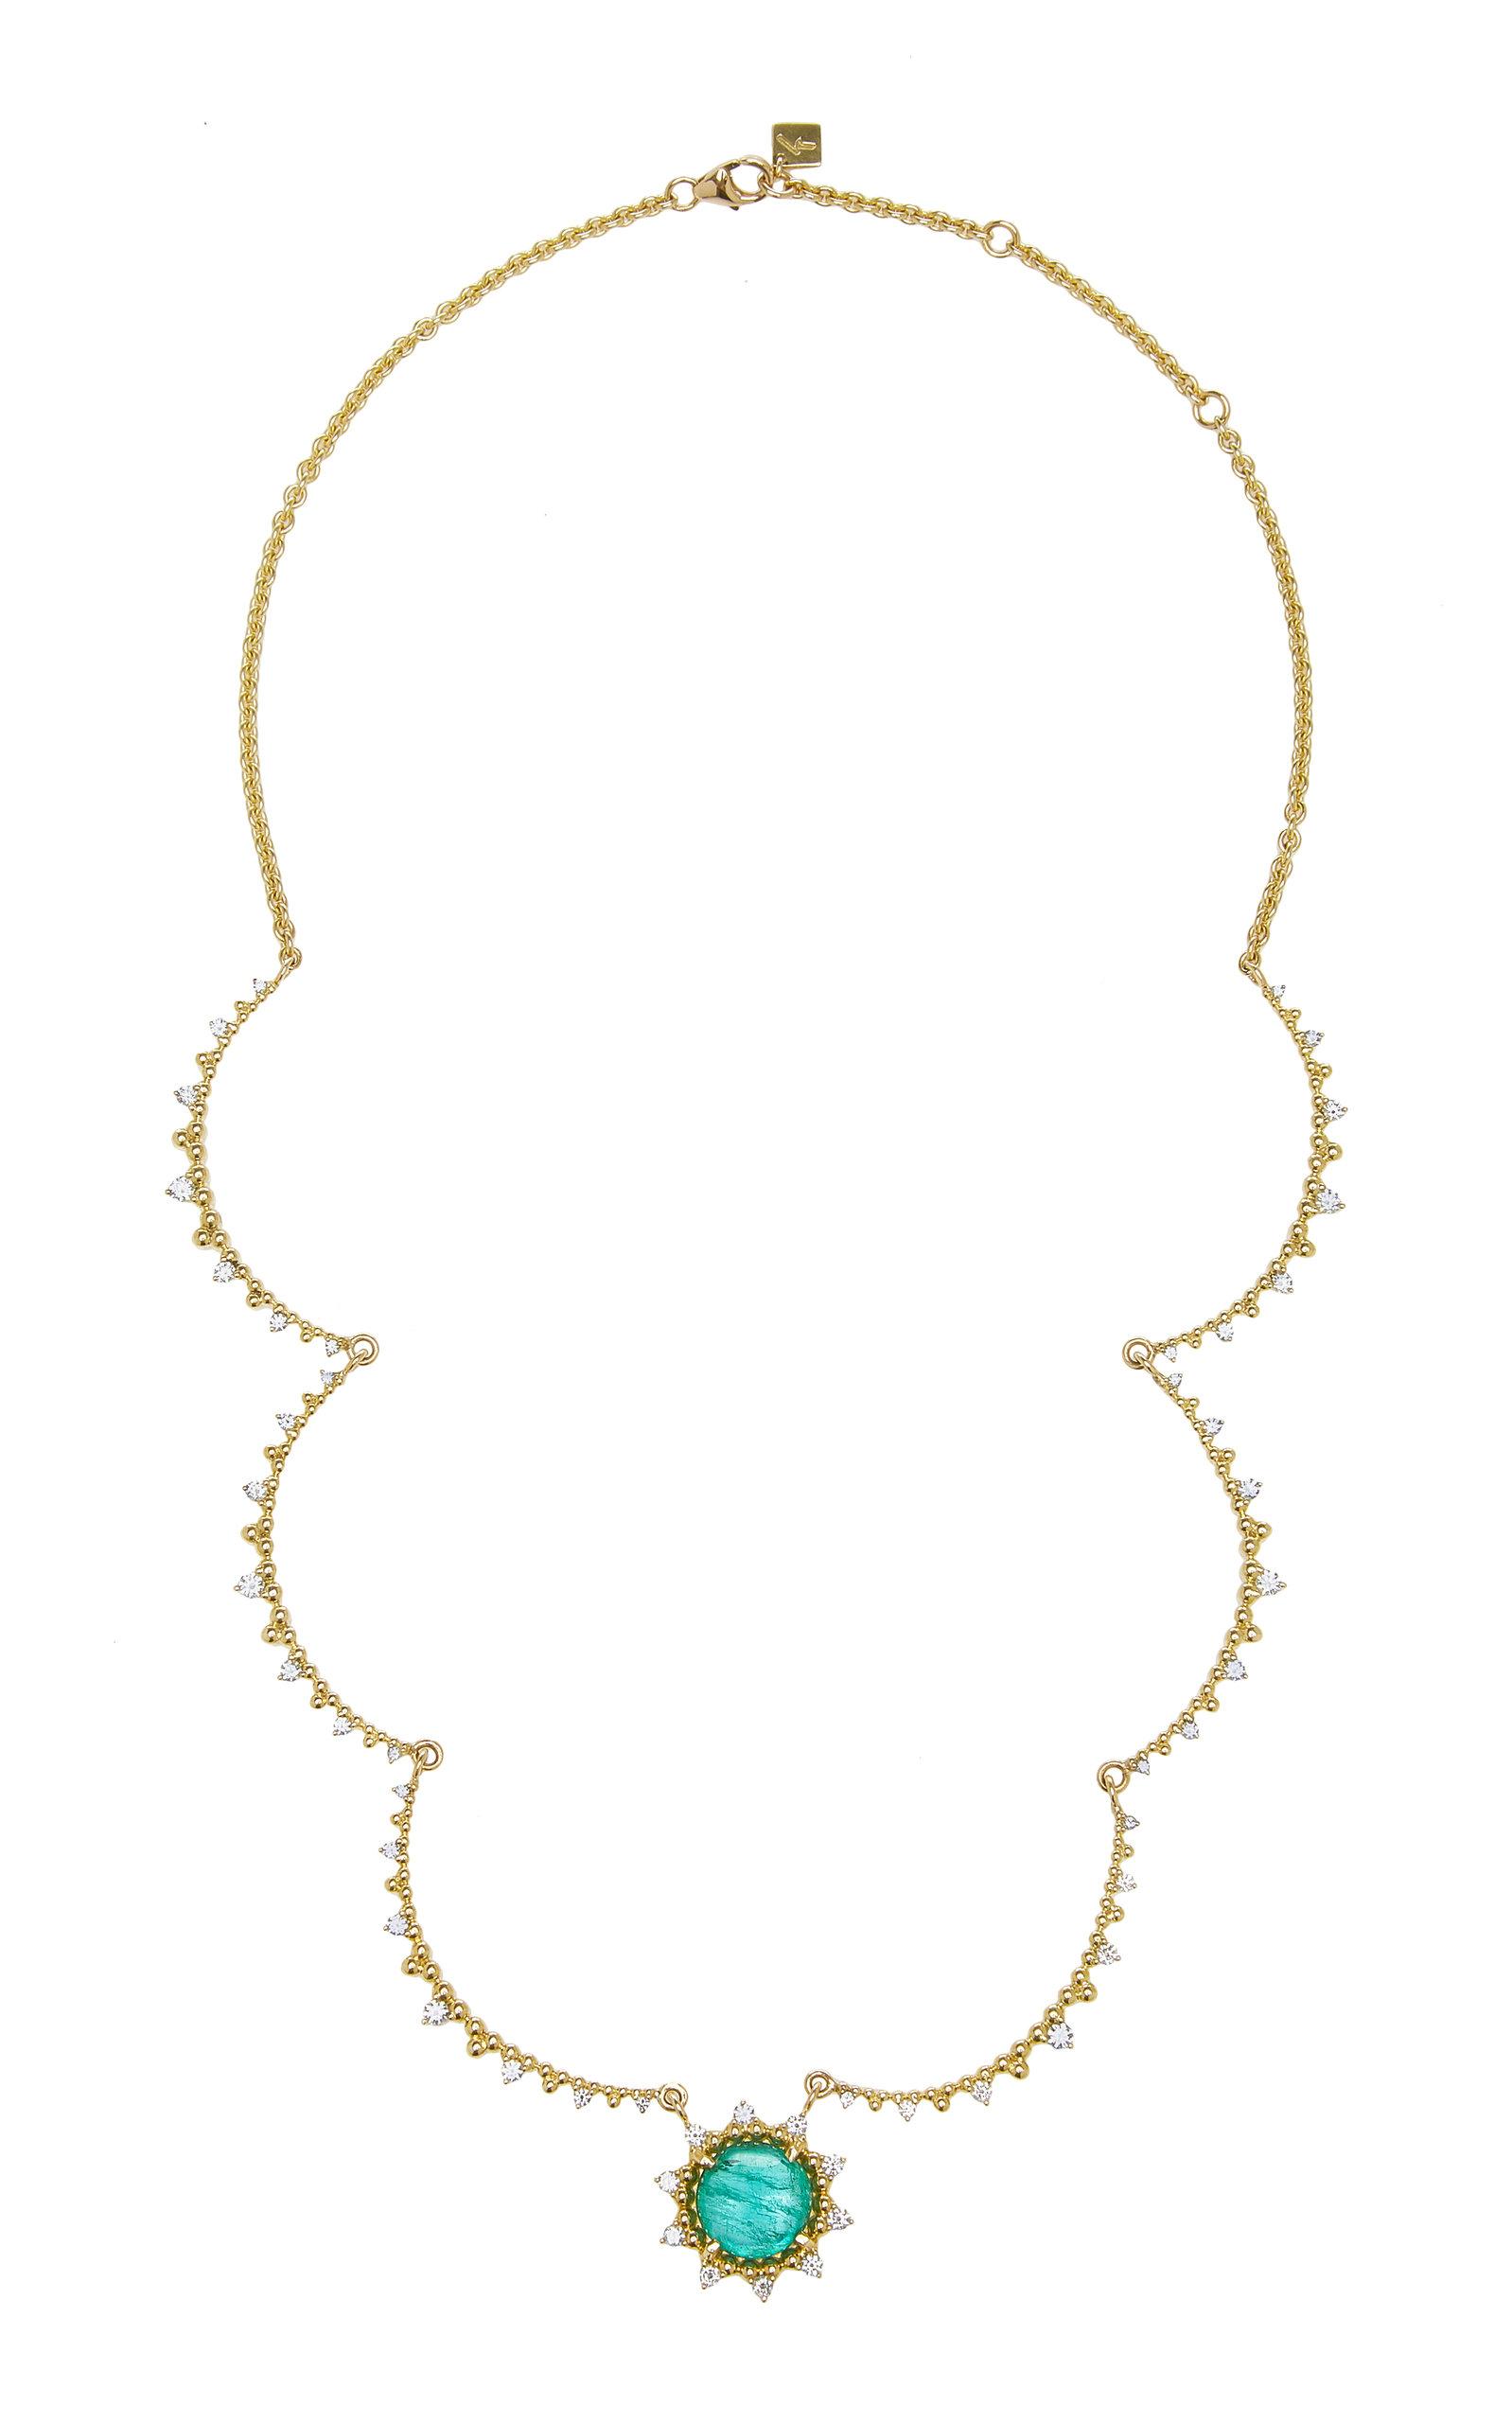 Women's Sunburst 18K Yellow Gold Emerald and Diamond Necklace